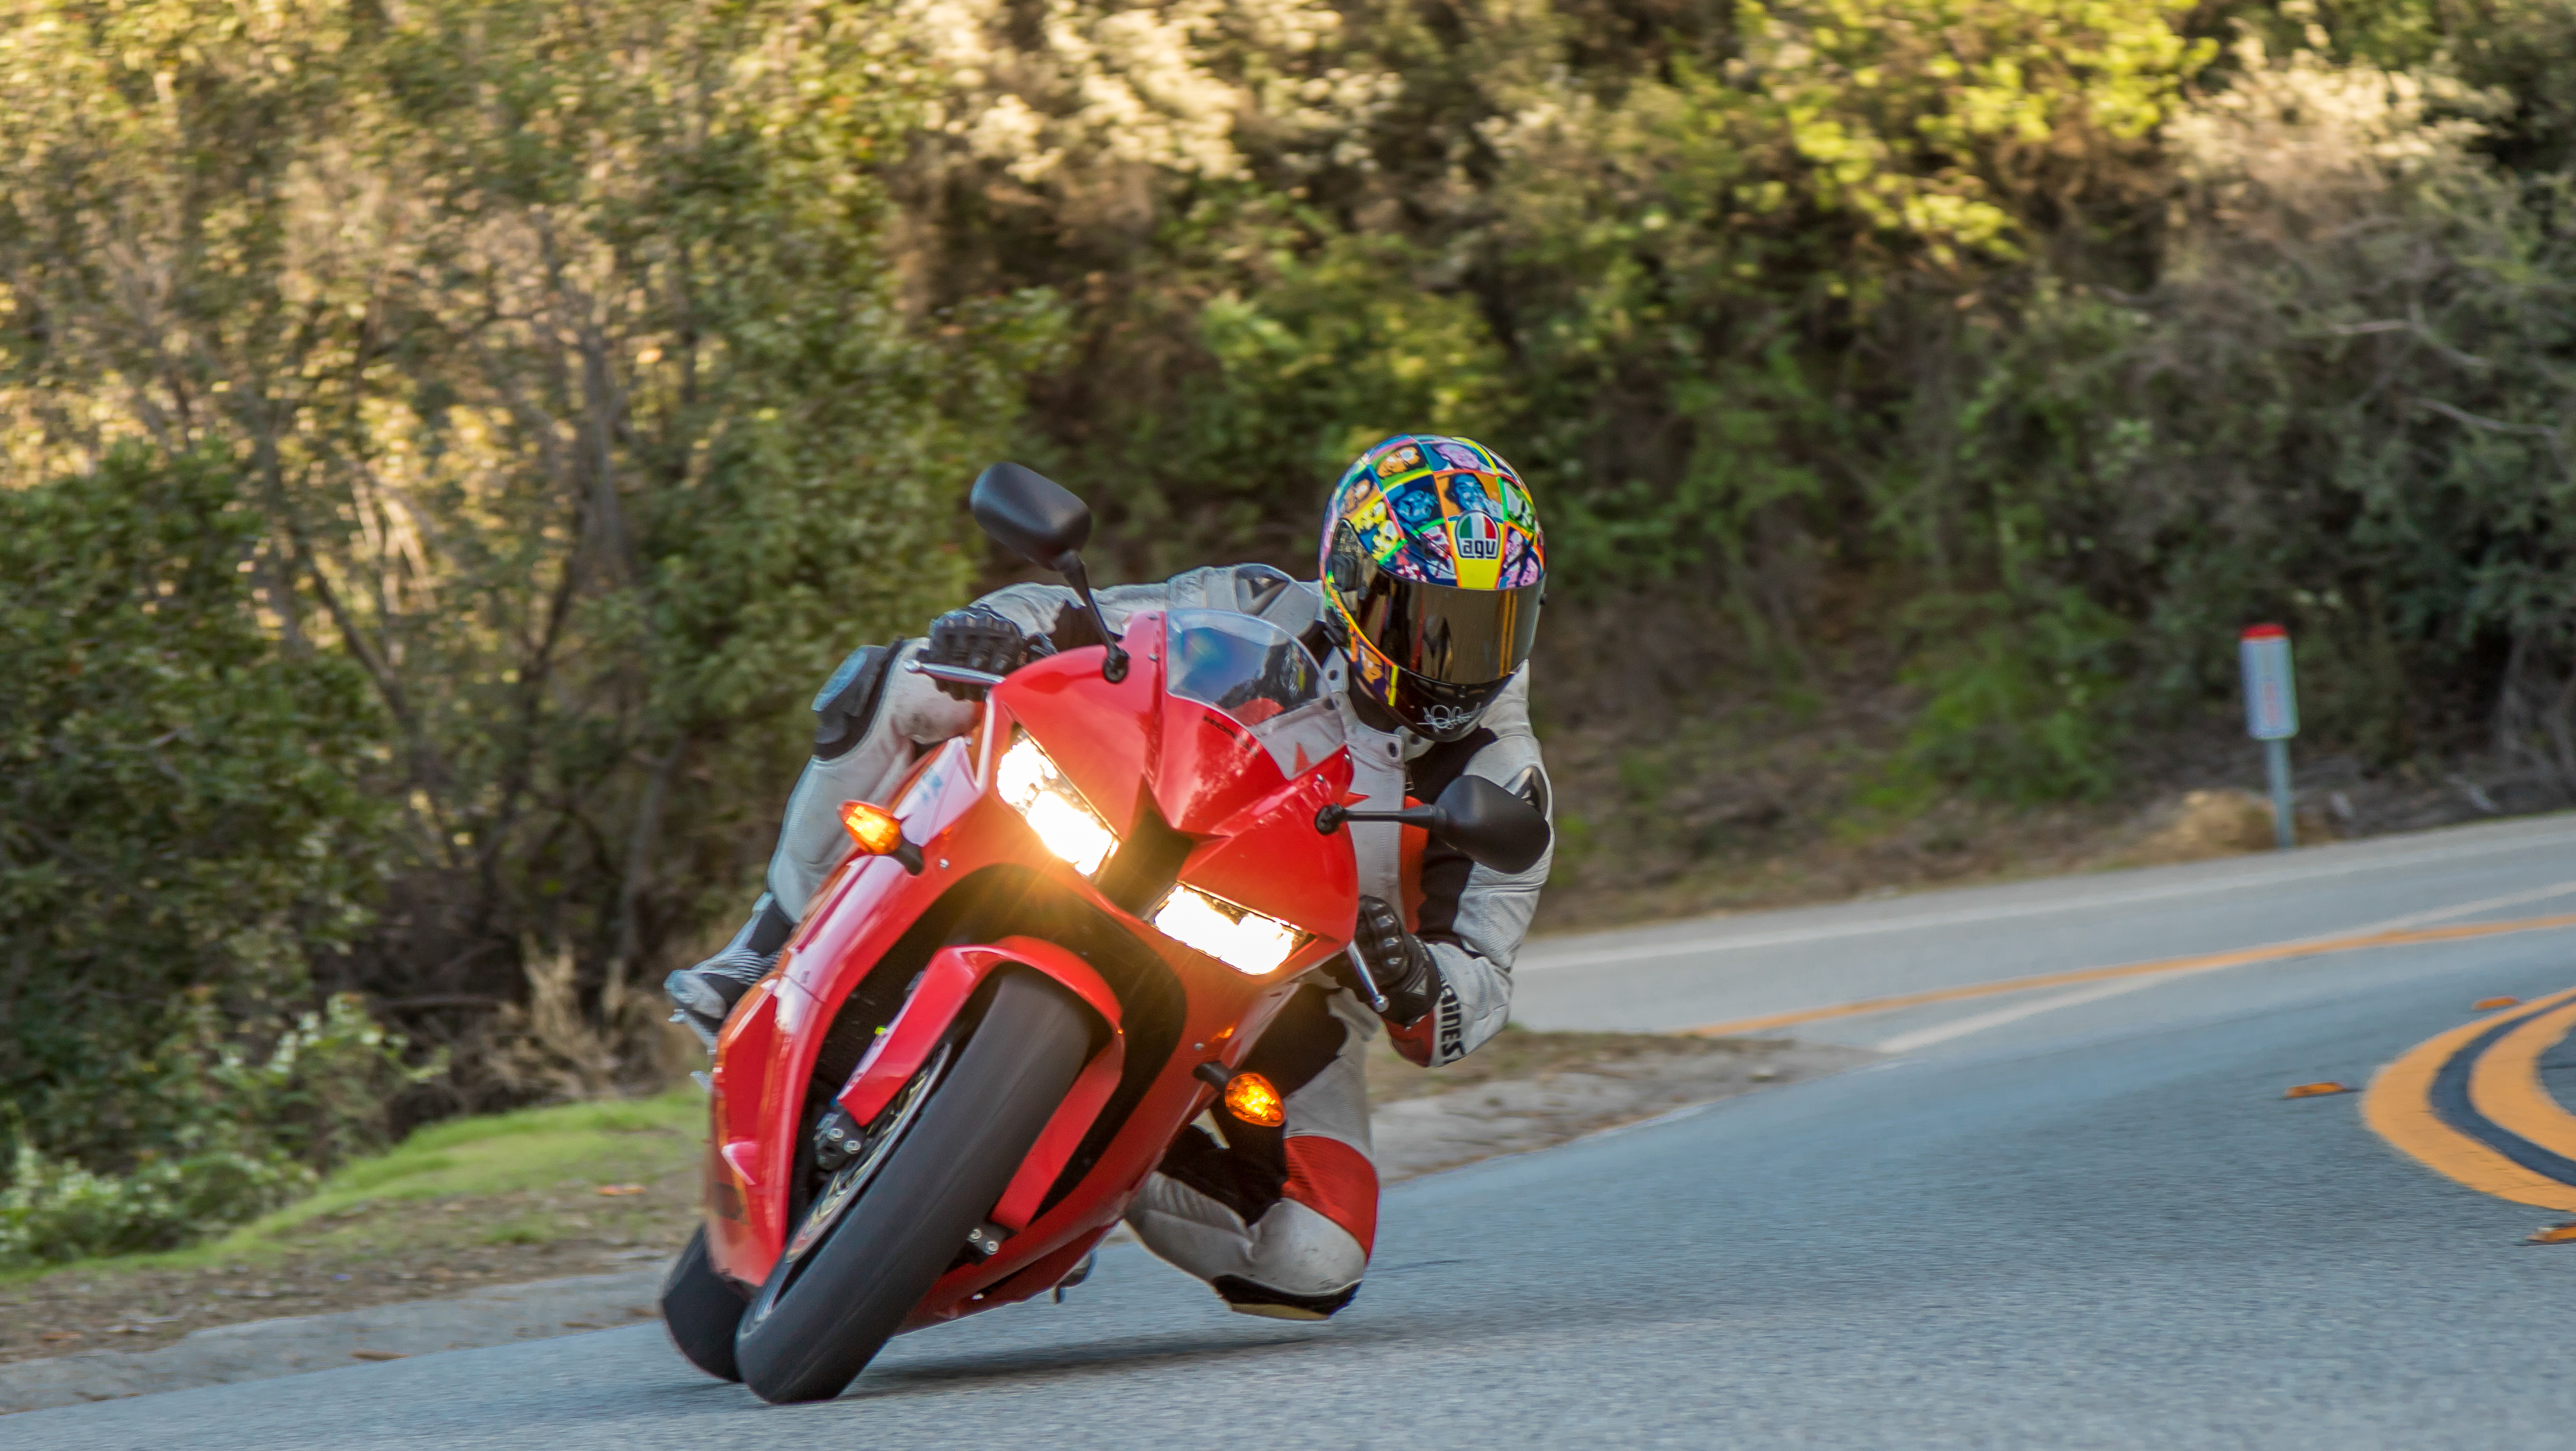 2015 Honda Cbr600rr Review Revzilla